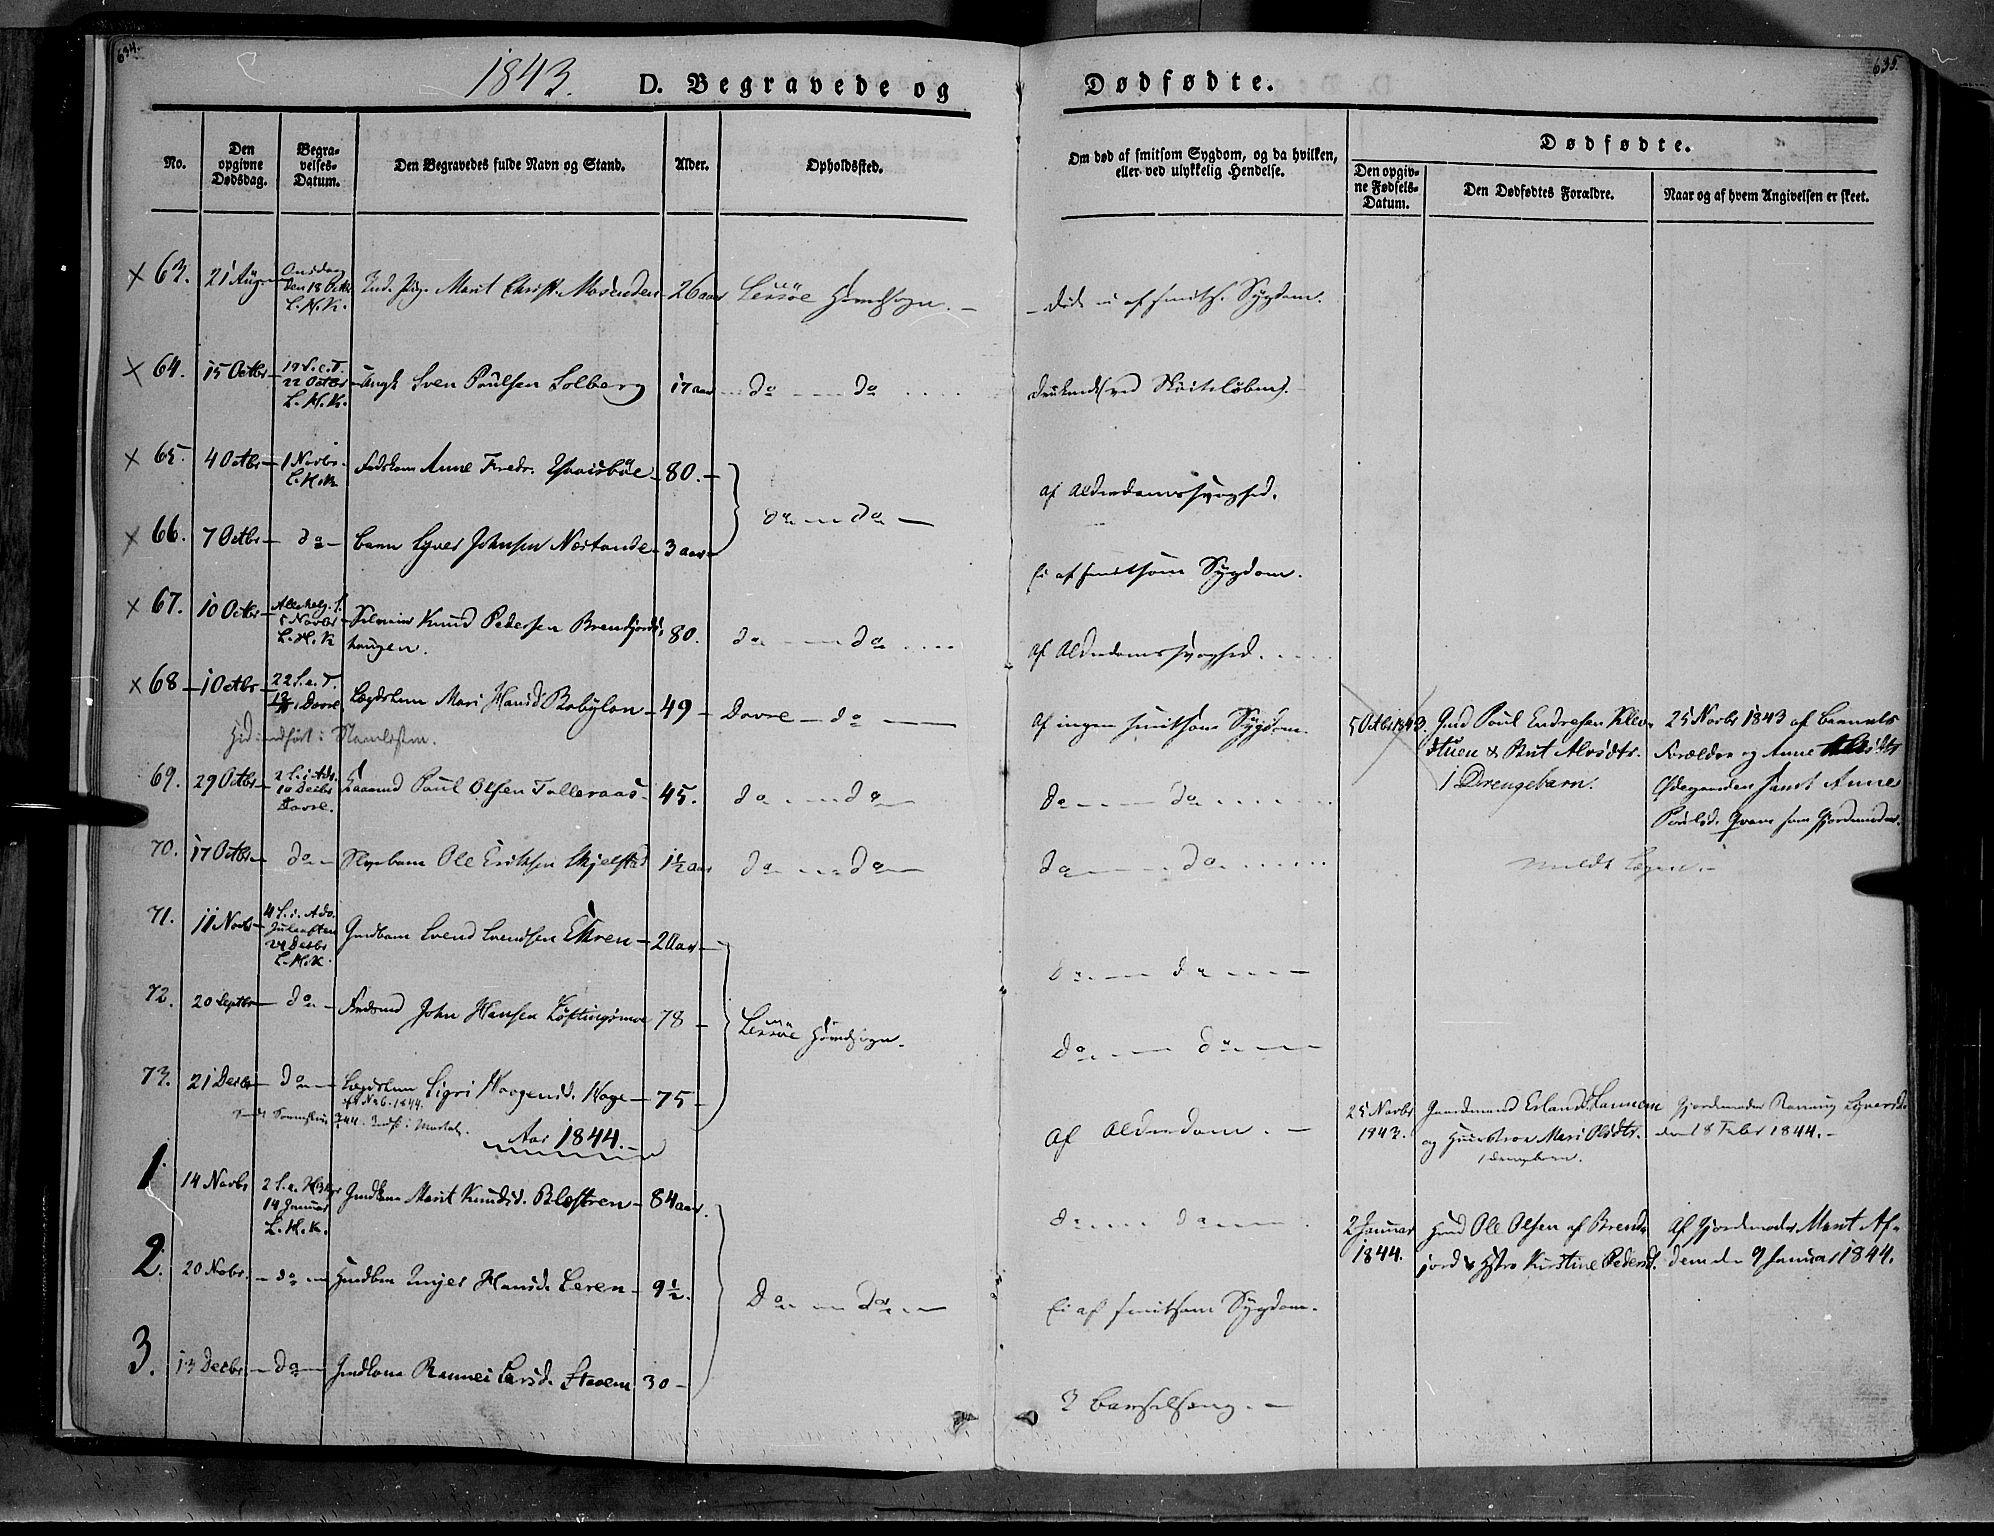 SAH, Lesja prestekontor, Ministerialbok nr. 6B, 1843-1854, s. 634-635